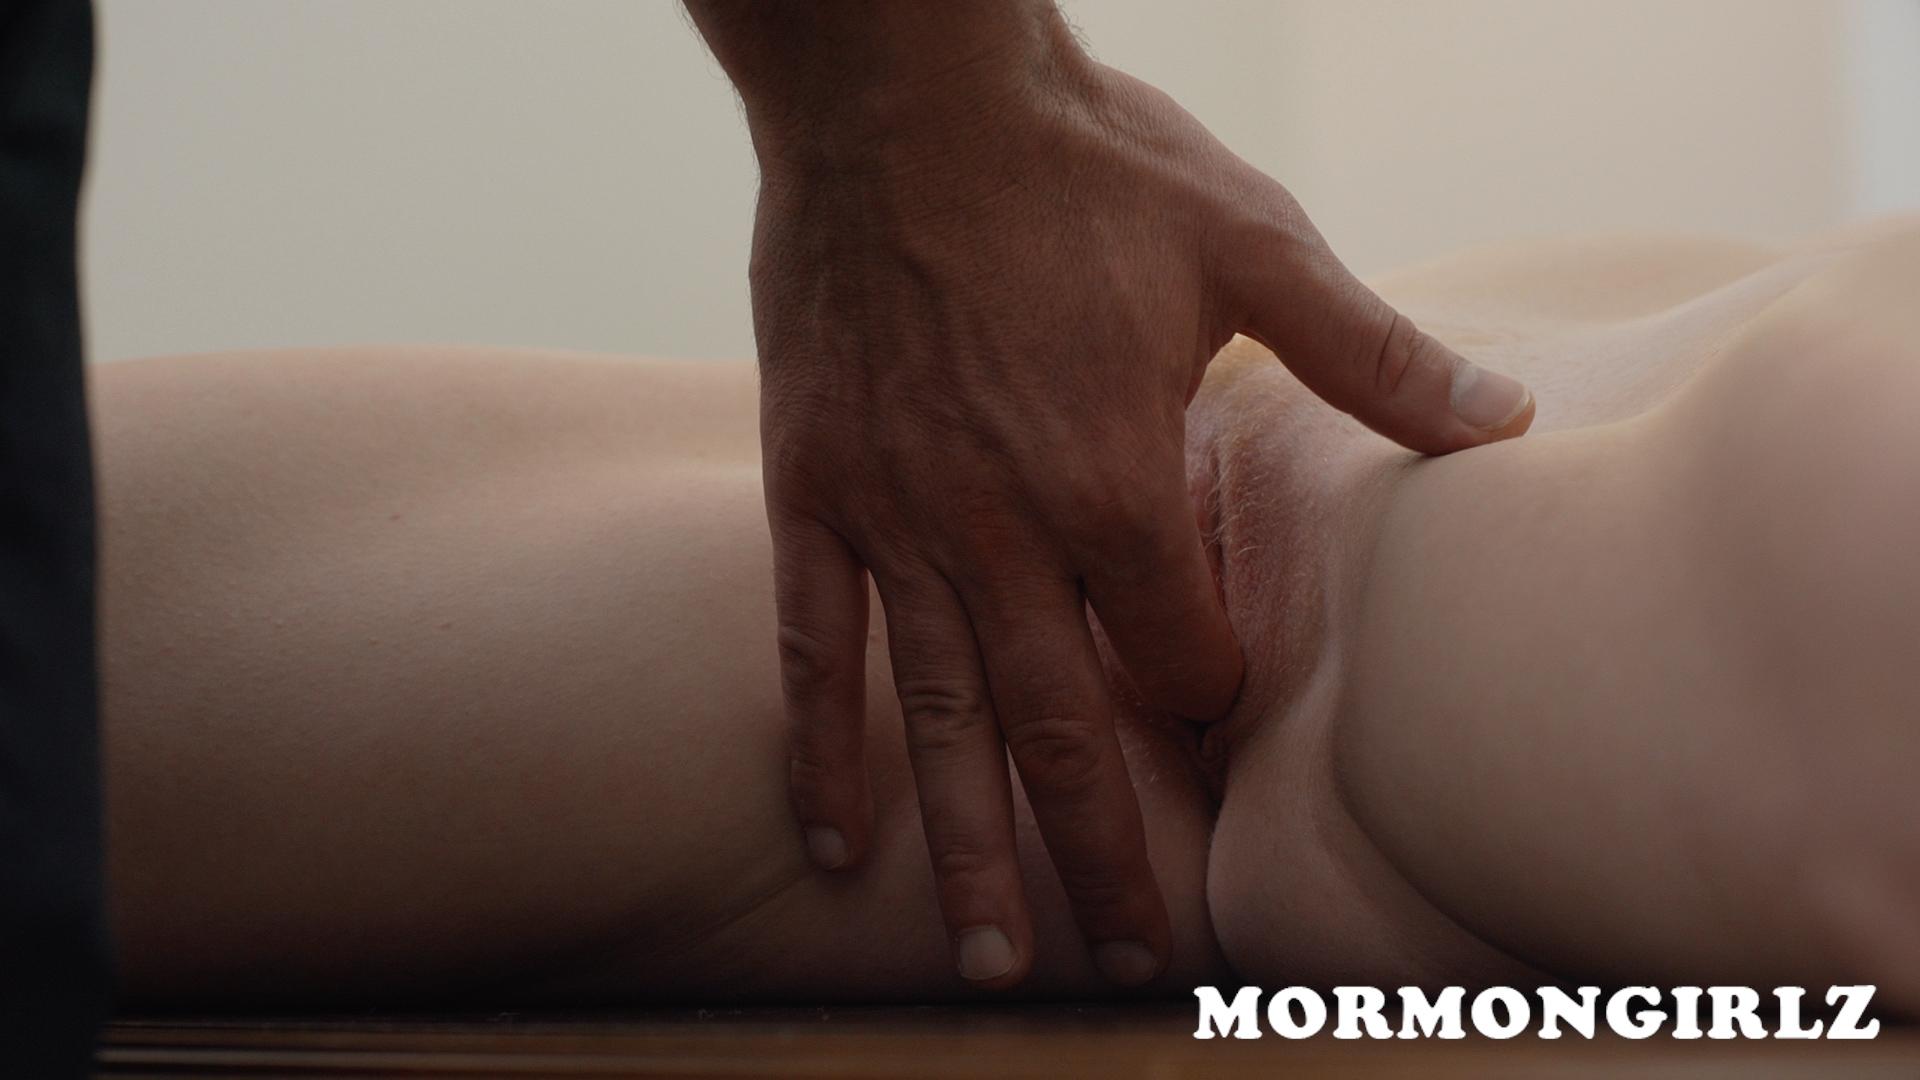 mormongirlz_70b_11